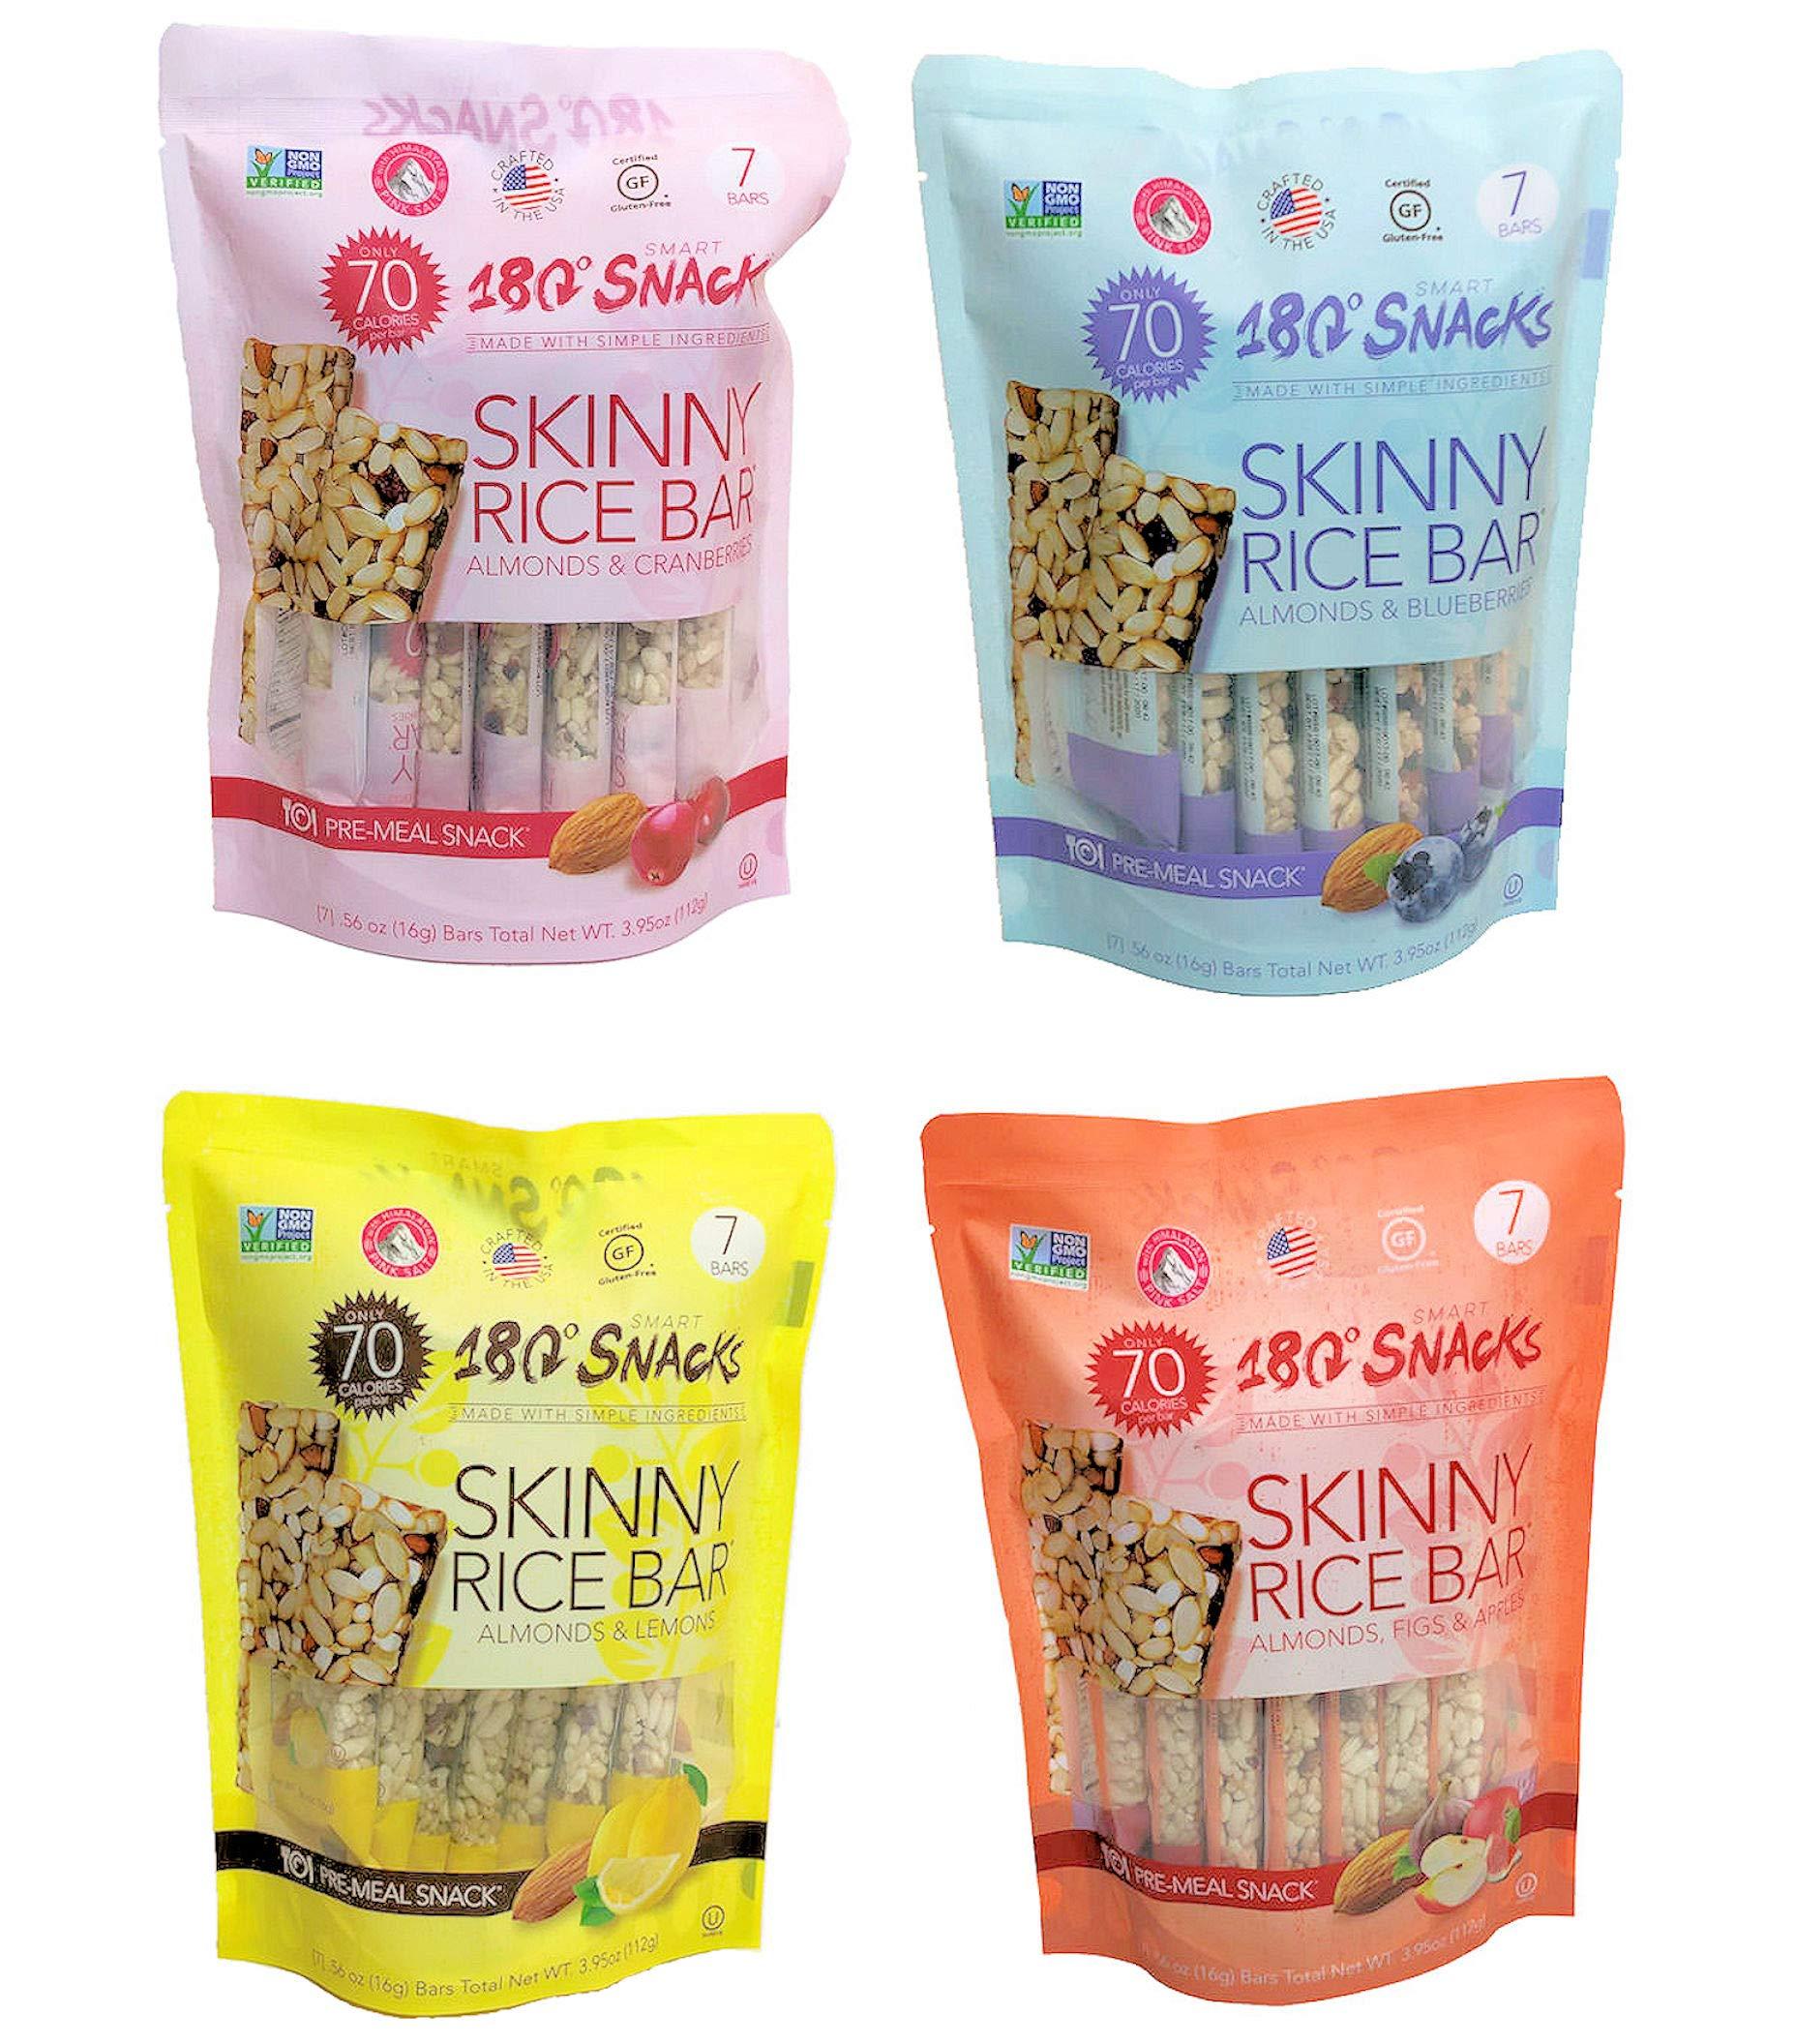 180 Snacks Pre-Meal Snack Skinny Rice Bar with Himalayan Salt Variety Bundle Pack (4) 3.22 oz each by 180 Snacks